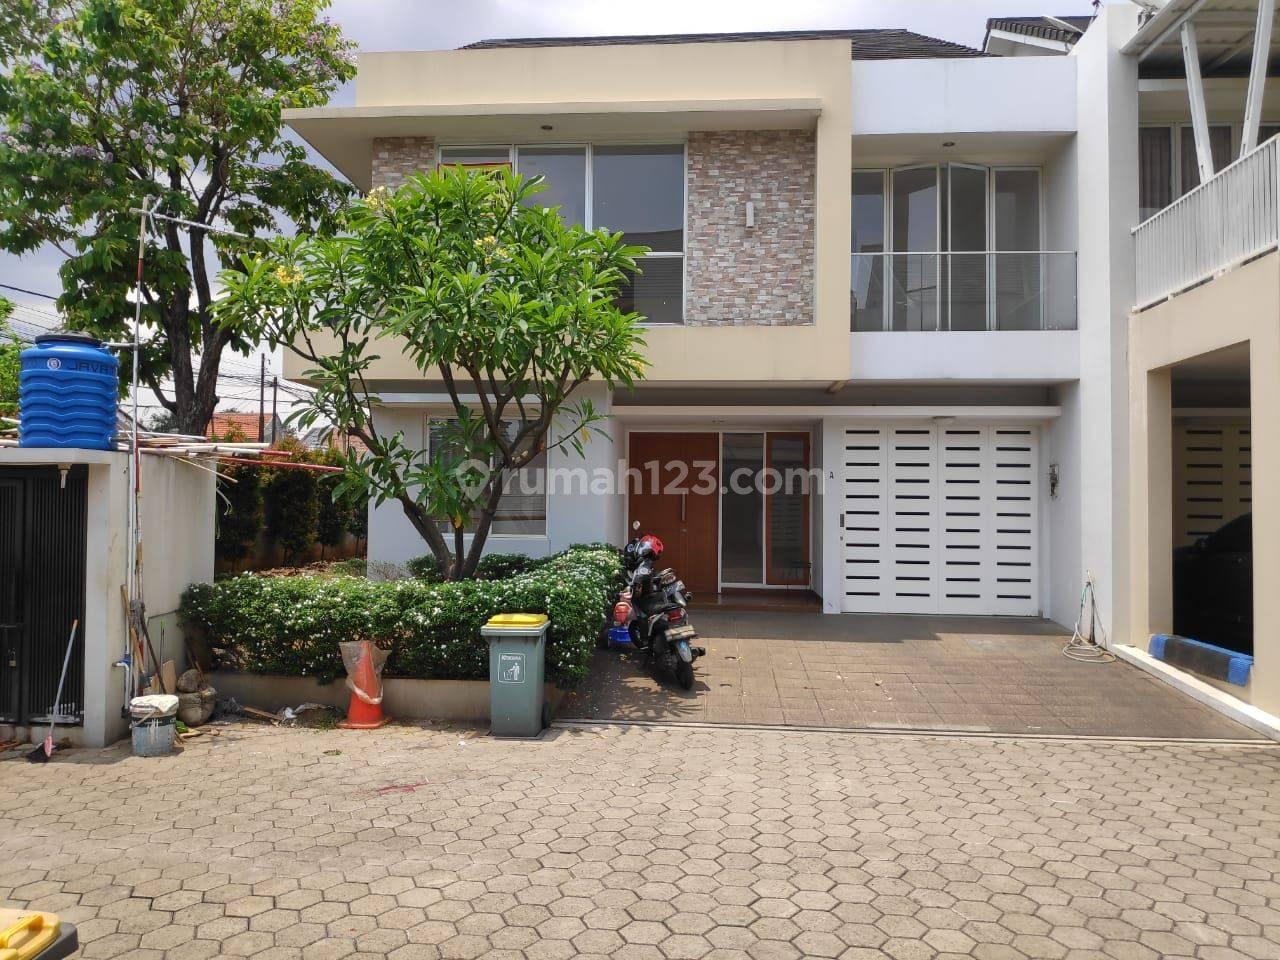 Rumah Mewah Cantik dan Asri di Kalibata Jakarta Selatan